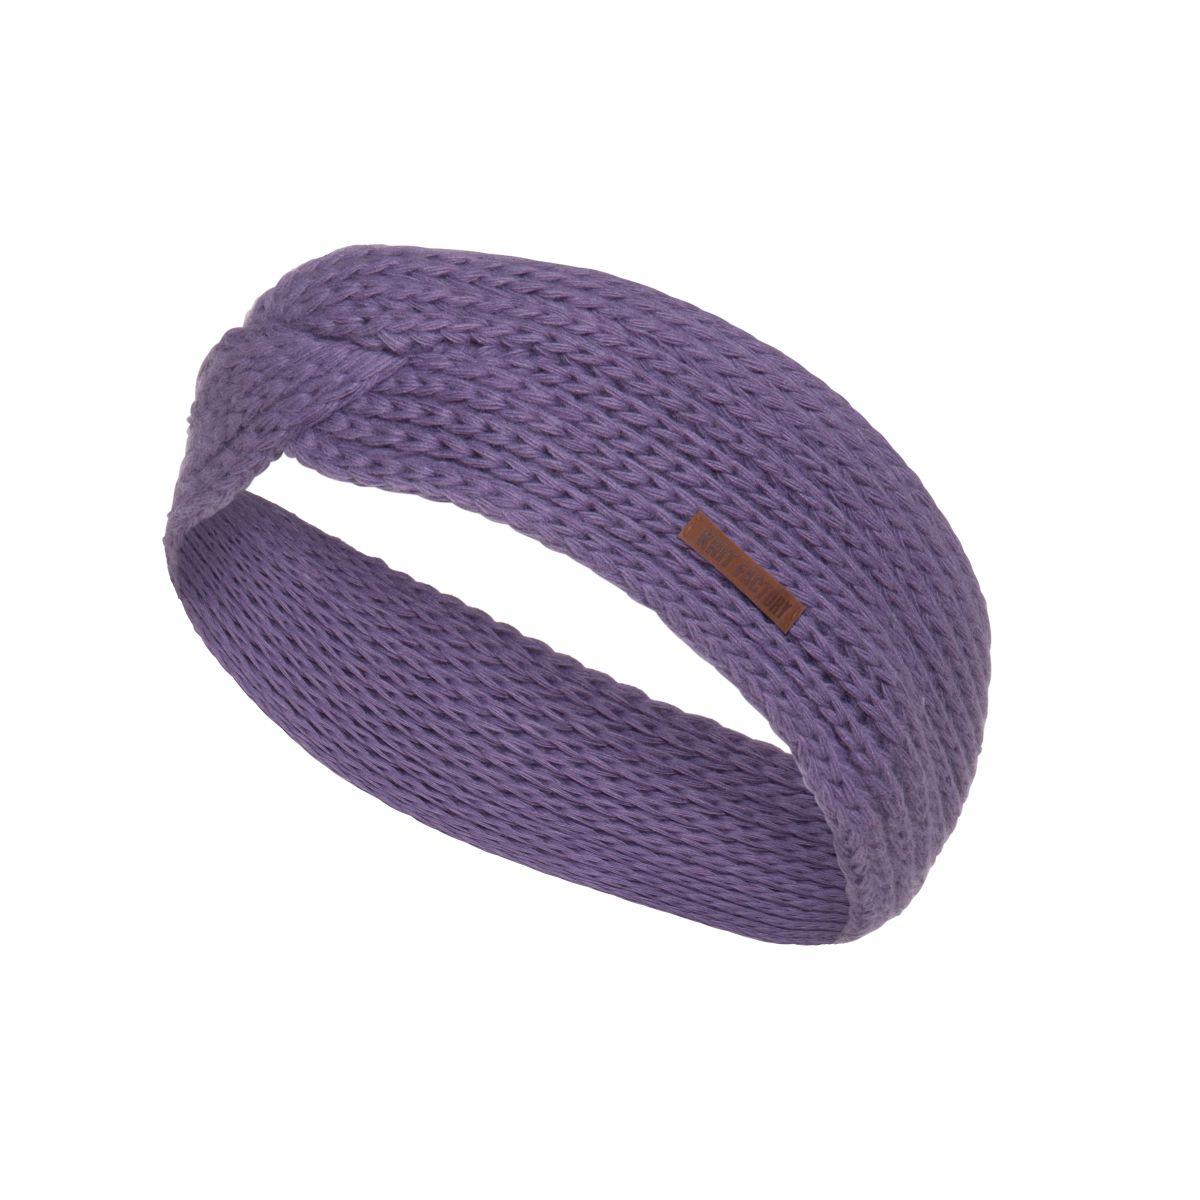 knit factory kf137069043 joy hoofdband violet 1